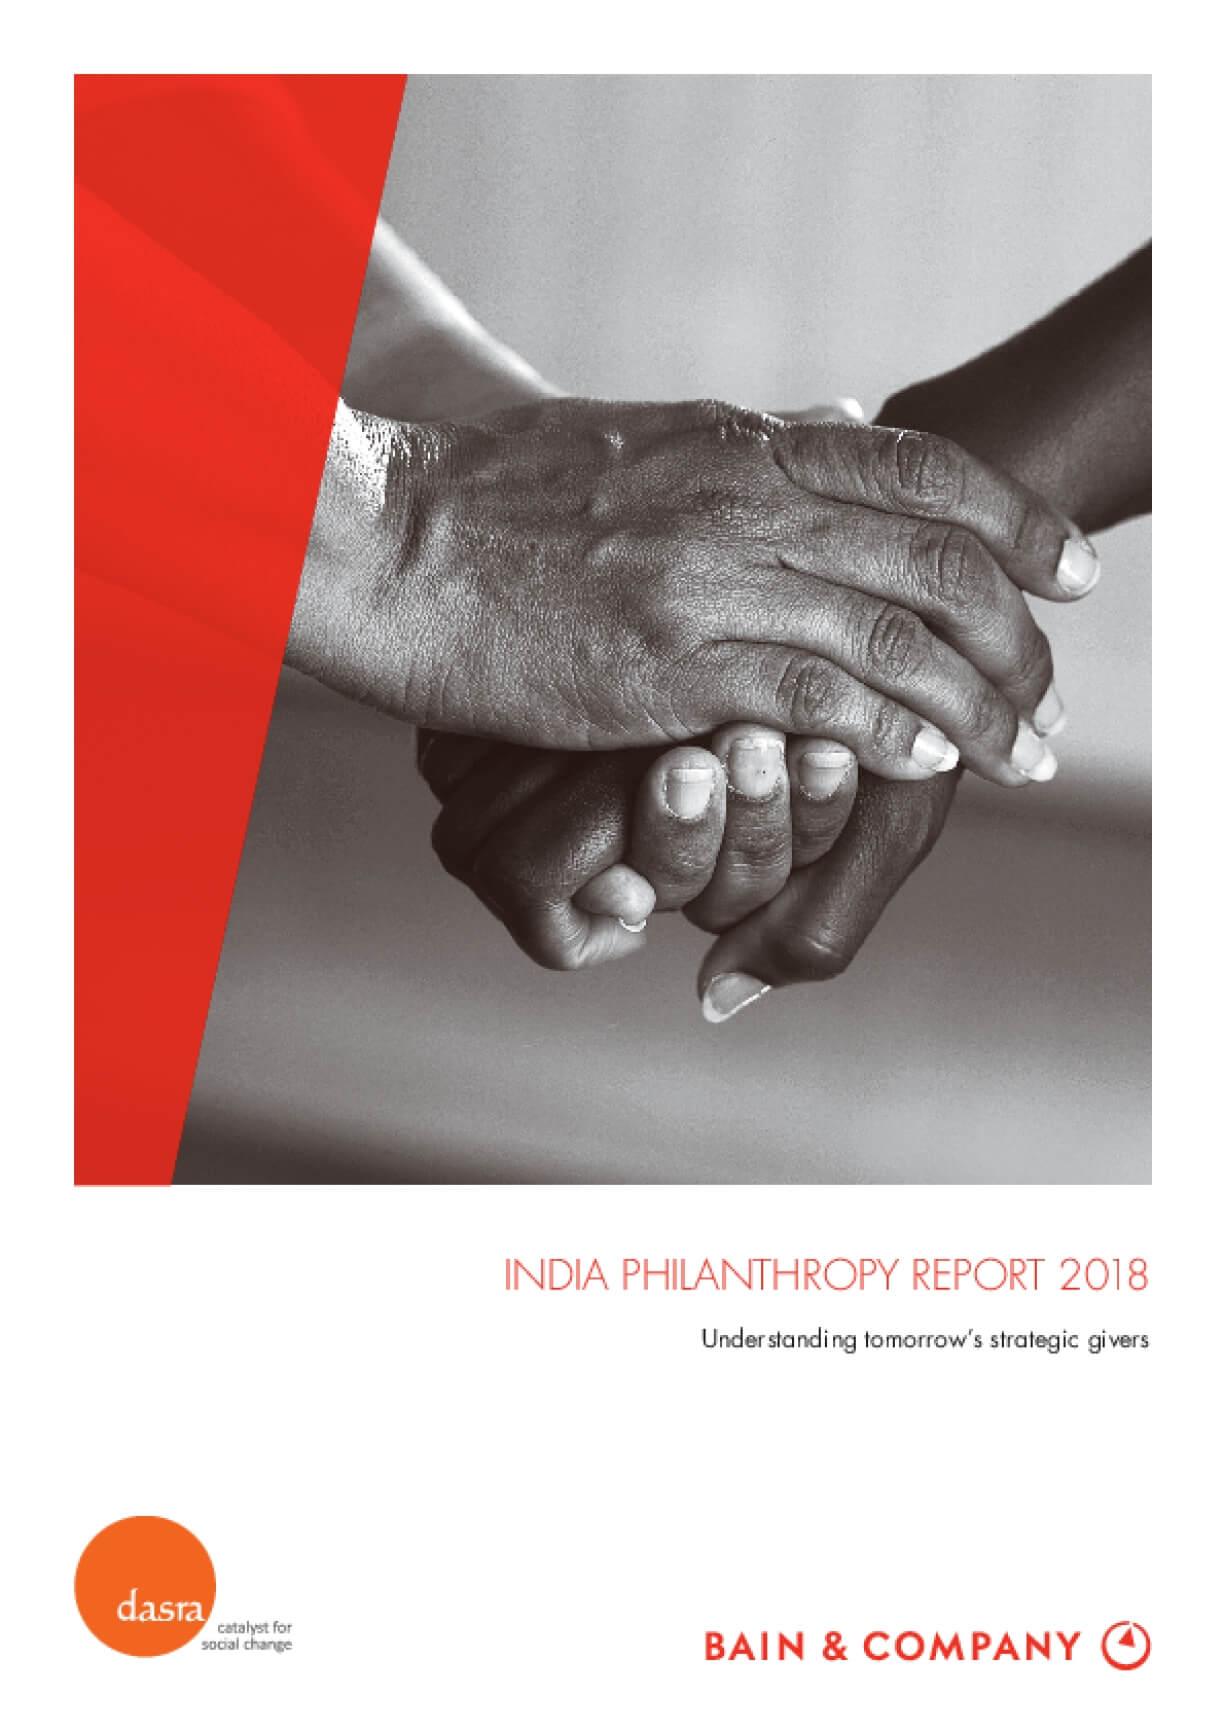 India Philanthropy Report 2018: Understanding tomorrow's strategic givers